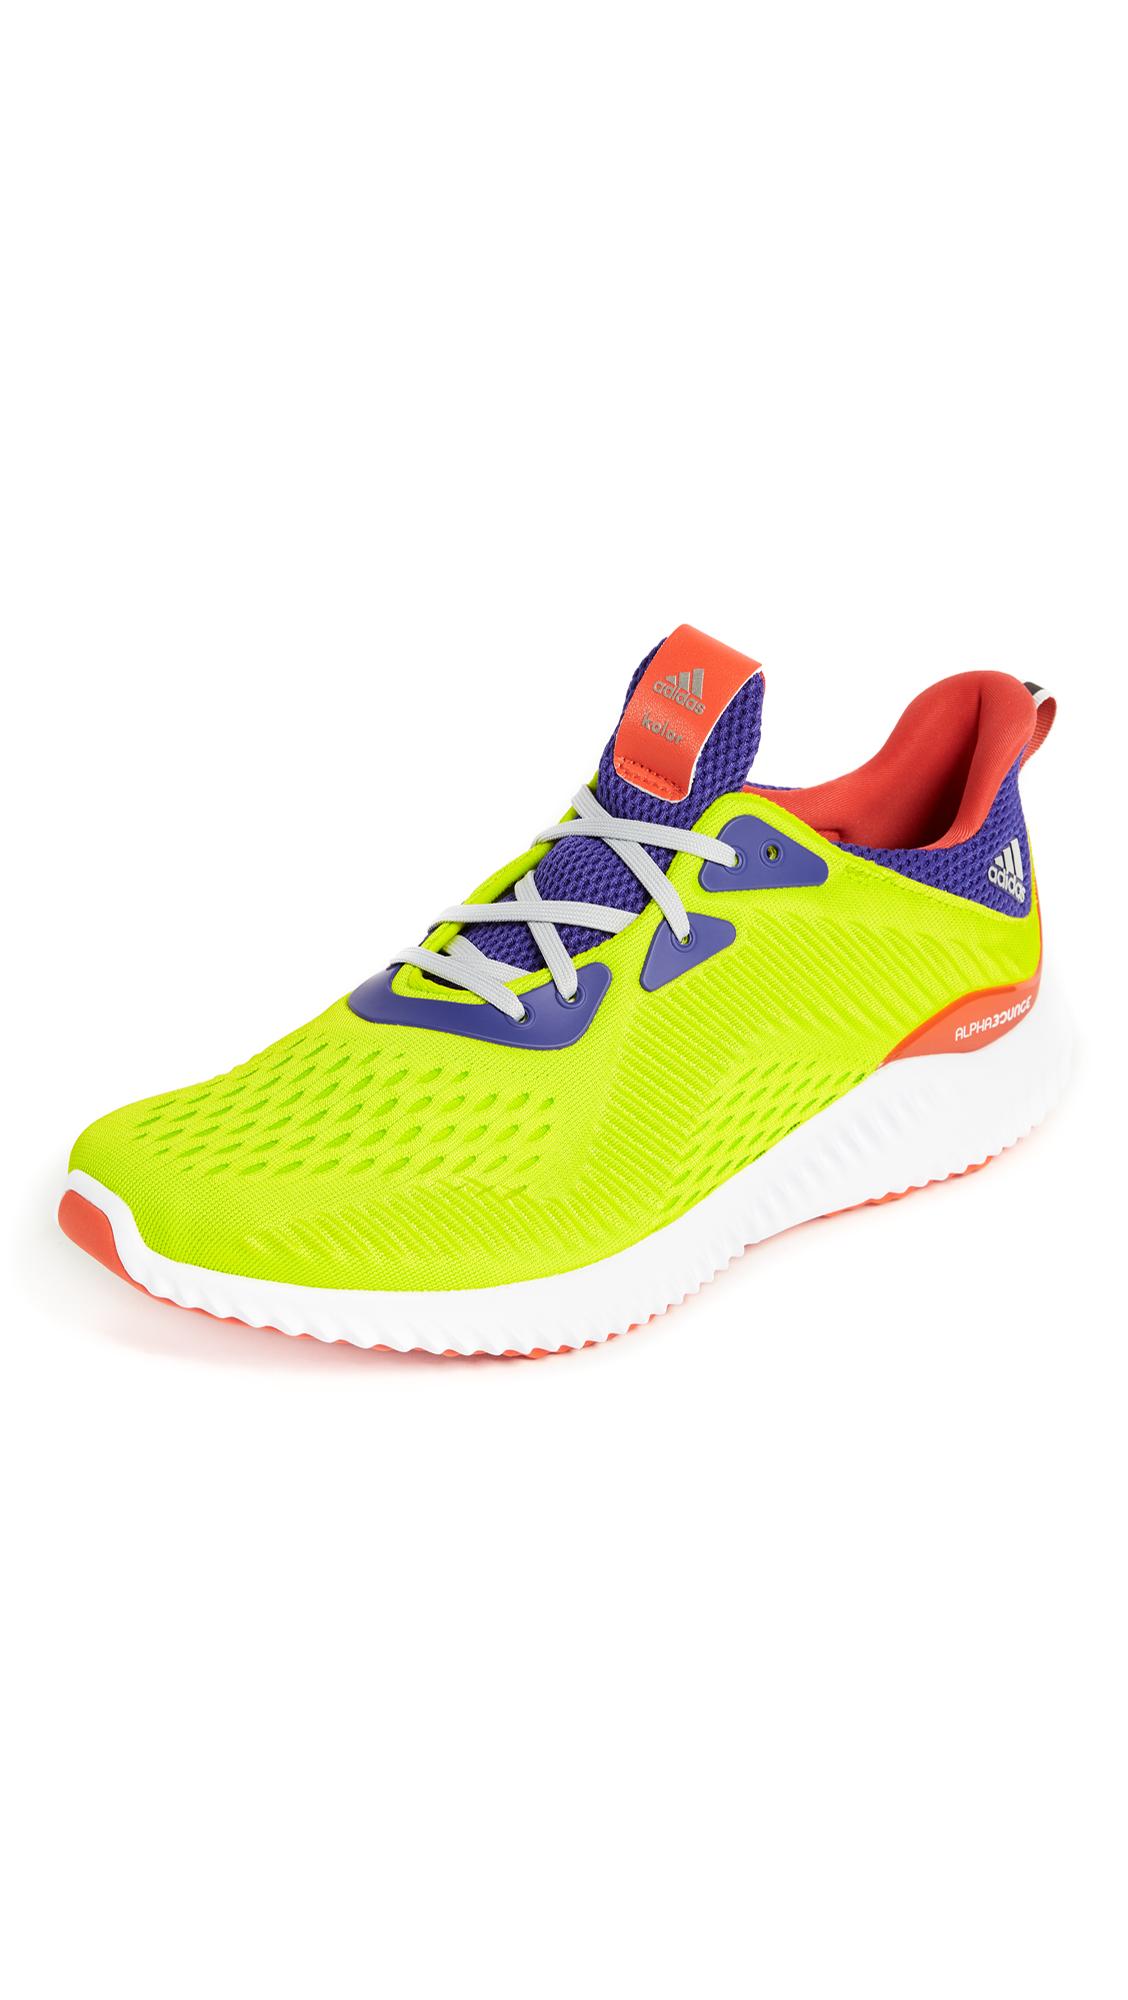 Adidas by Kolor Alphabounce 1 KOLOR Sneakers